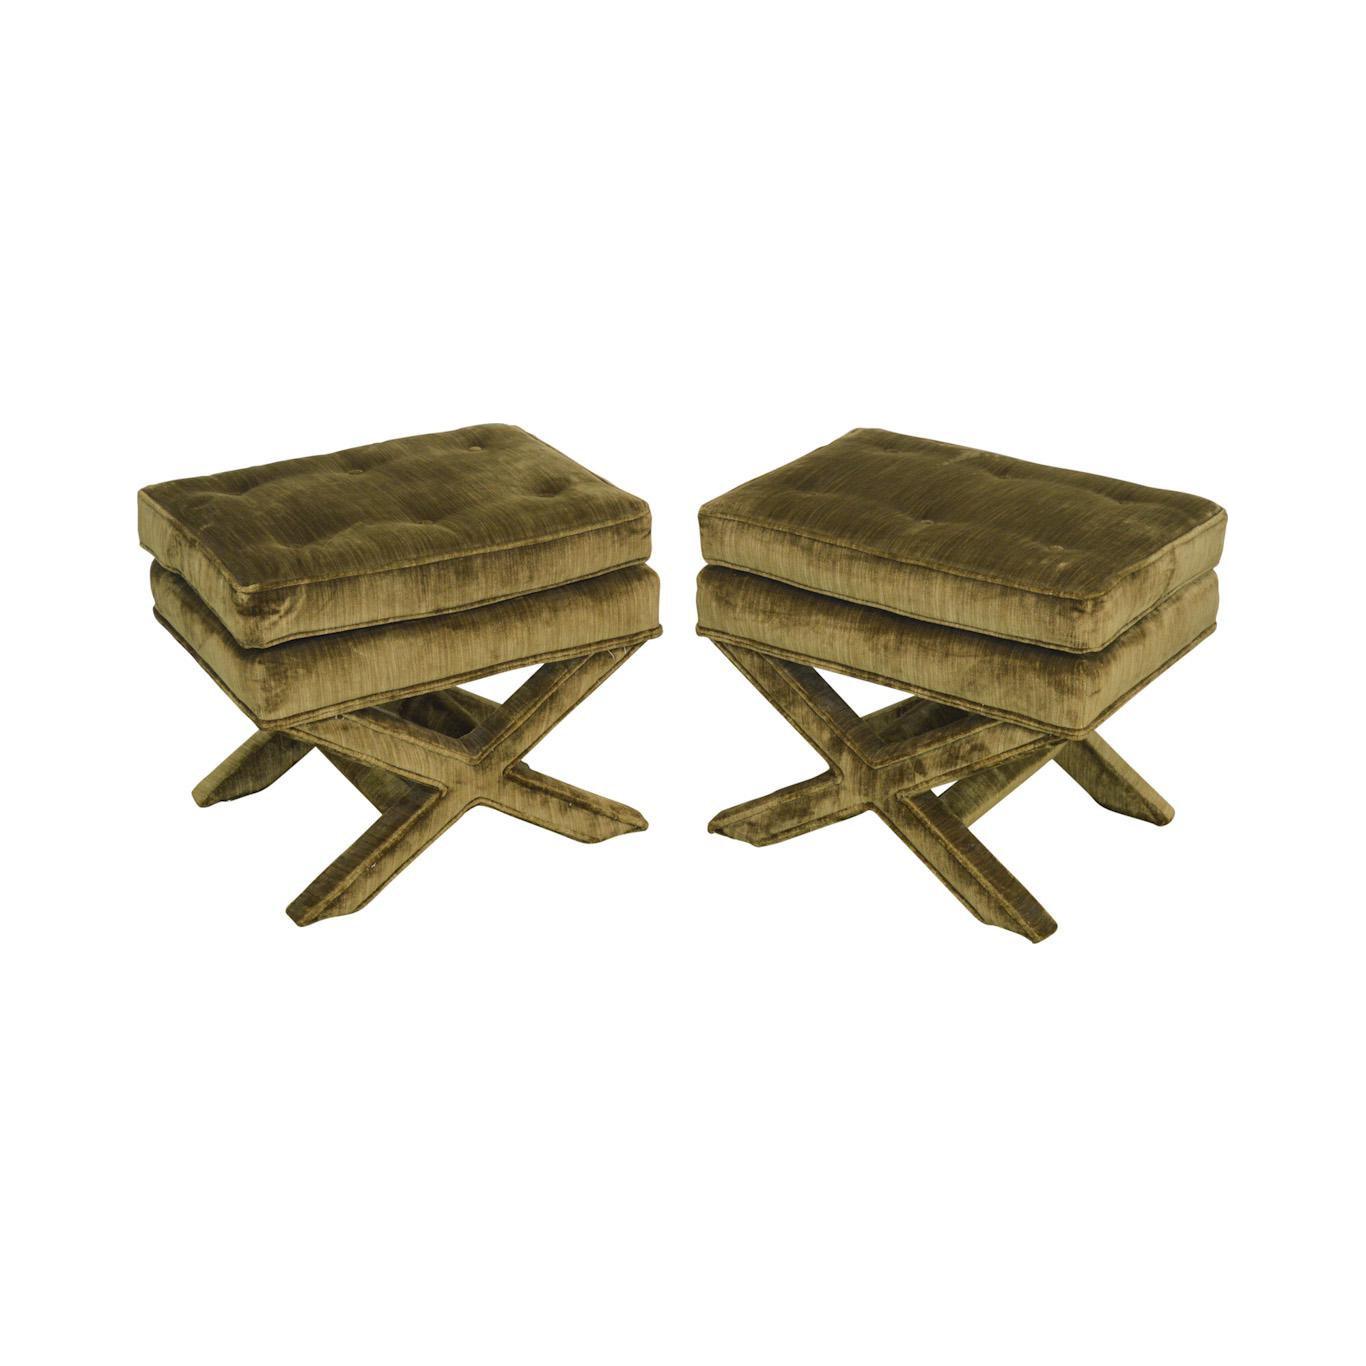 Henredon n c Schoonbeck Billy Baldwin Style Vintage Pair of Upholstered X Benches